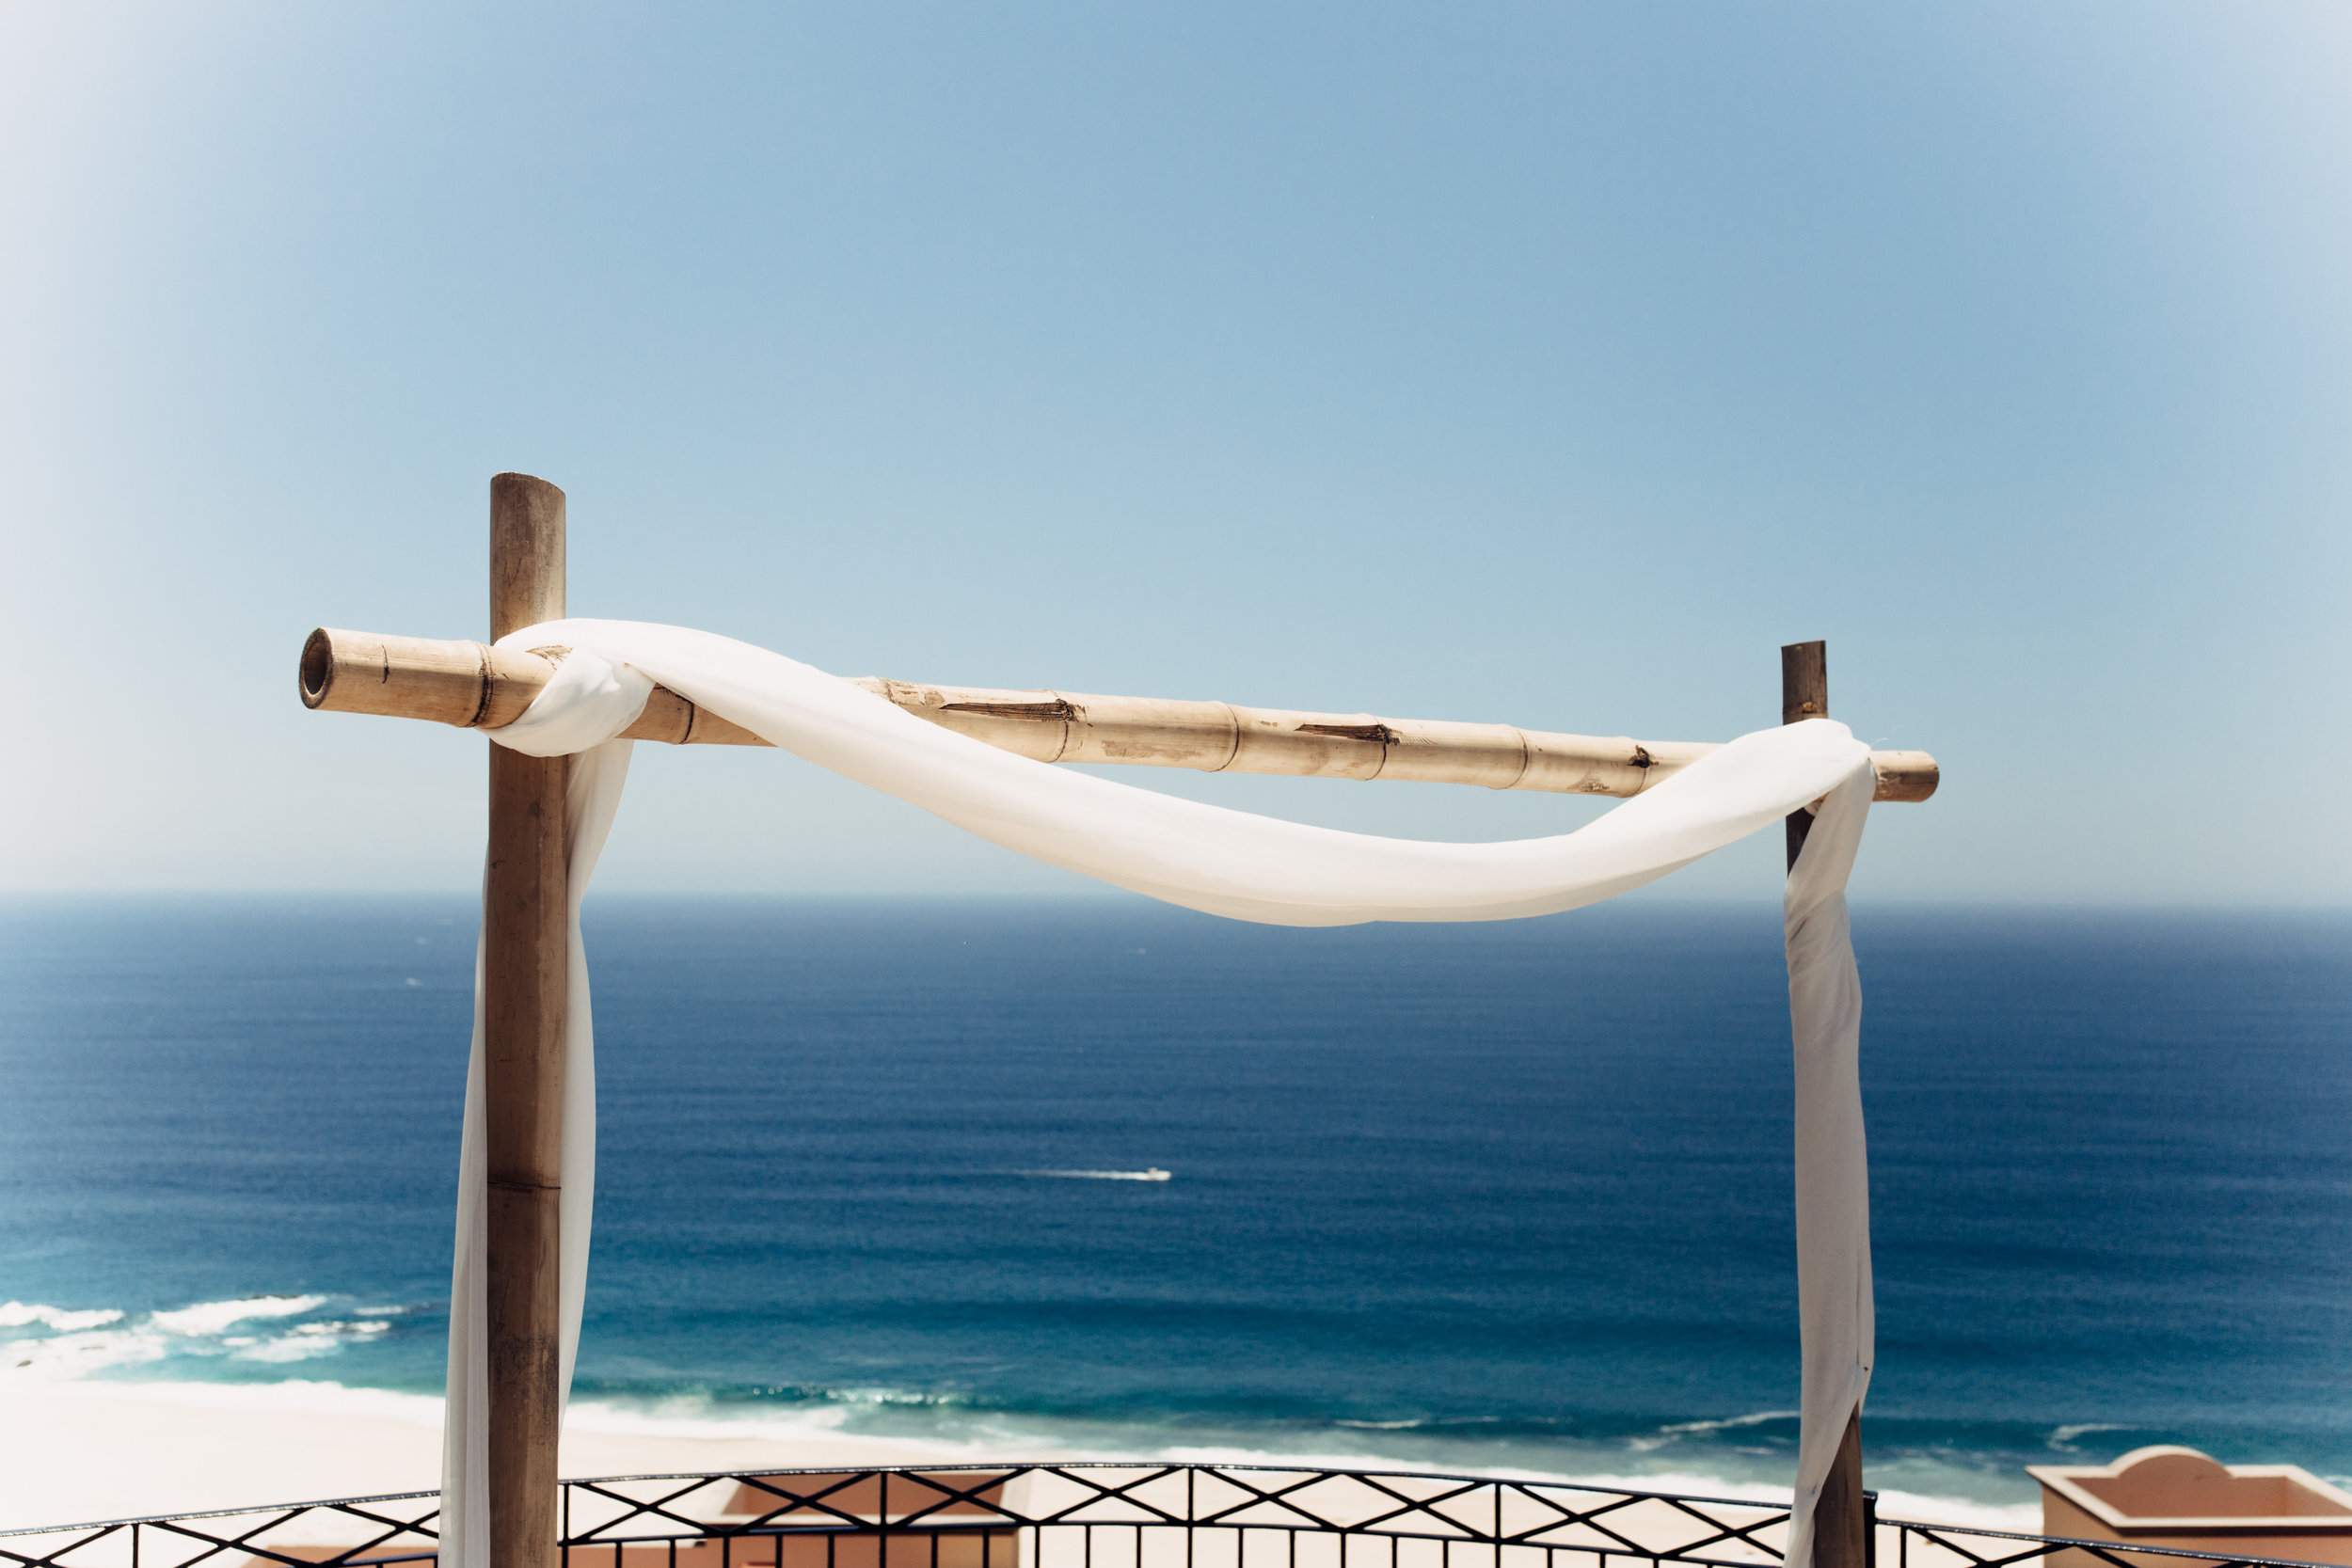 pueblo-bonito-sunset-beach-wedding-cabo-san-lucas9.jpg